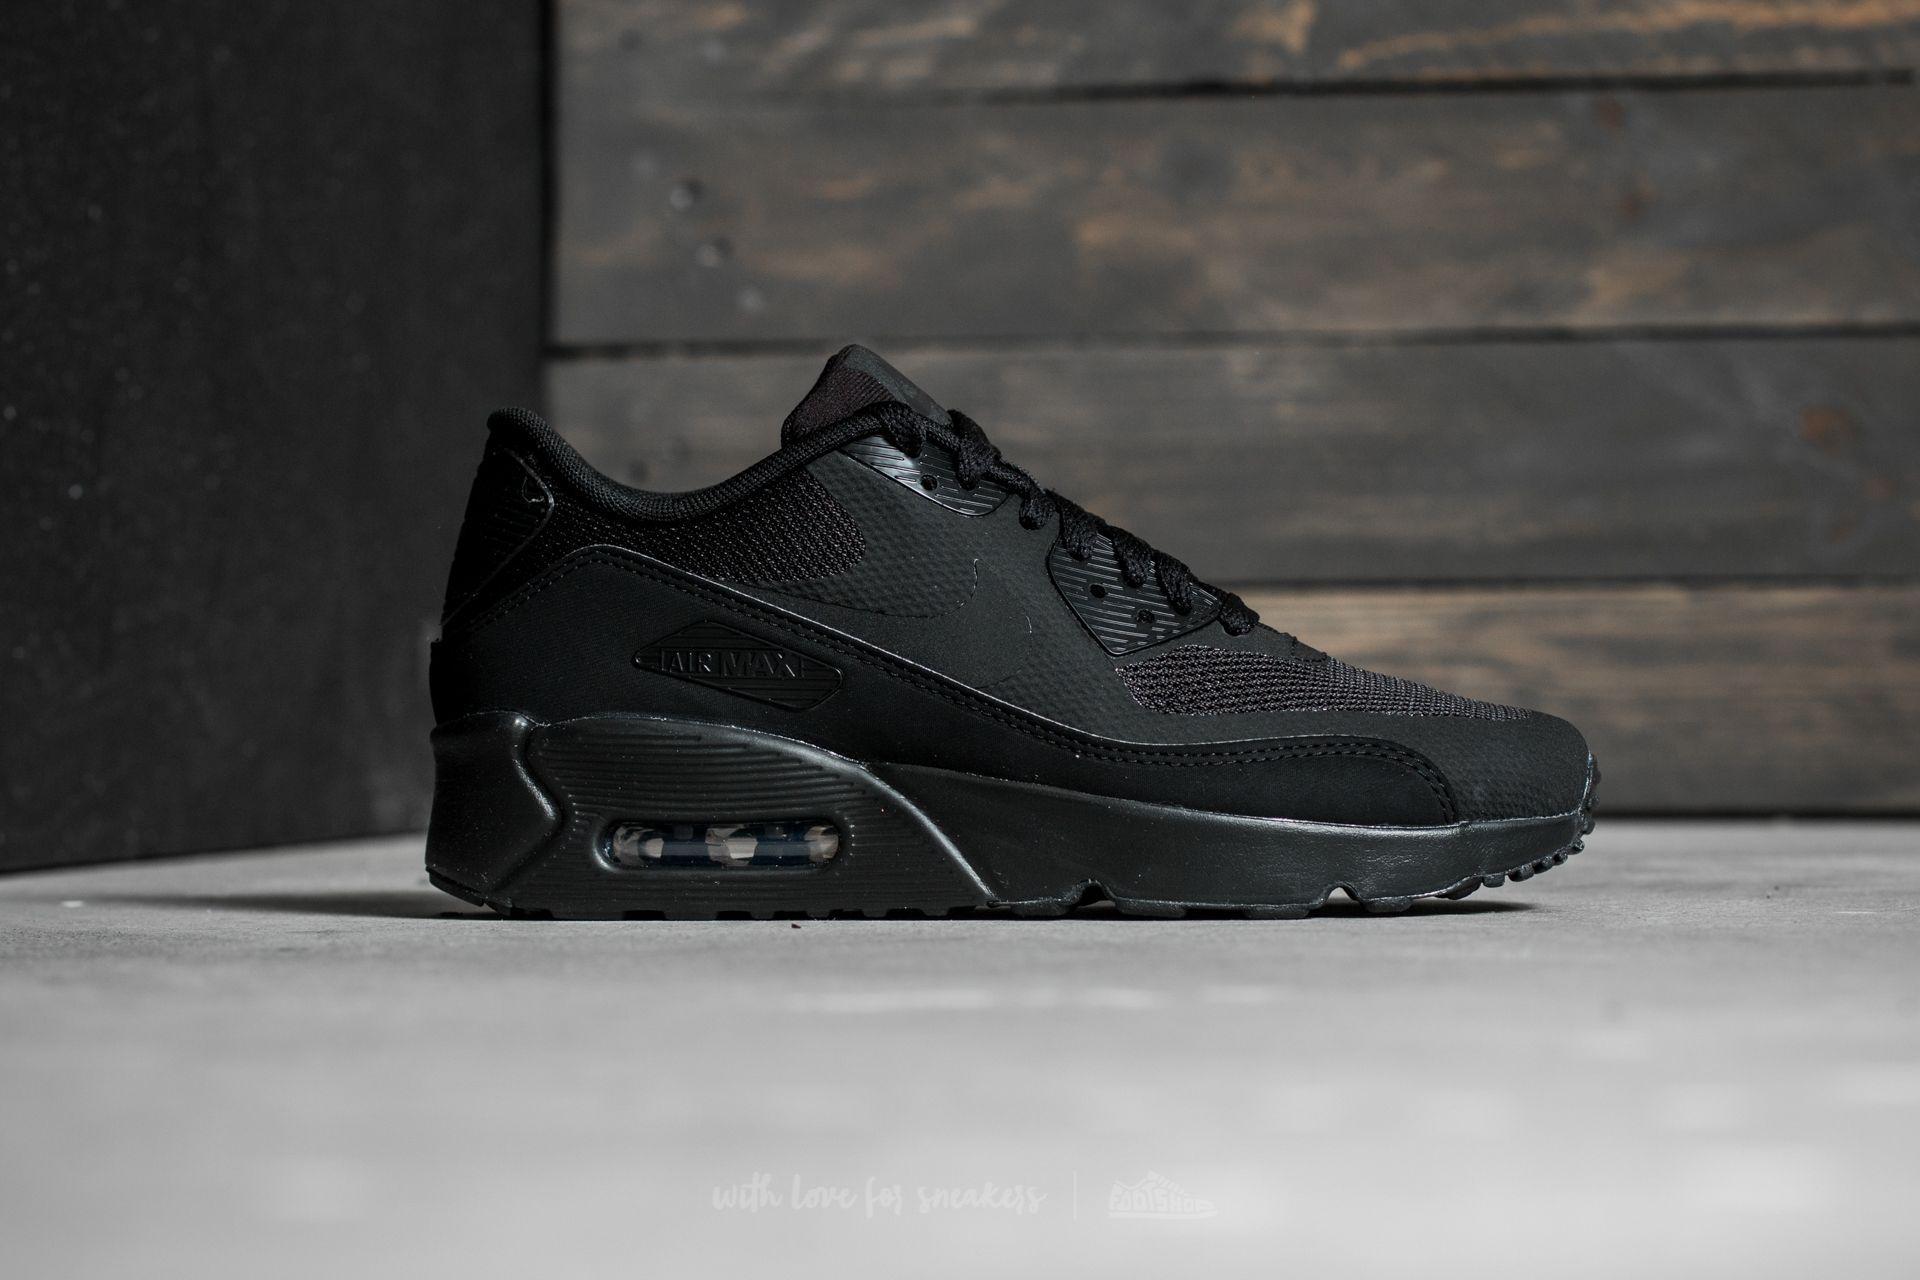 factory authentic ec0cc fbbdf Nike Air Max 90 Ultra 2.0 (GS) Black/ Black-Black | Footshop